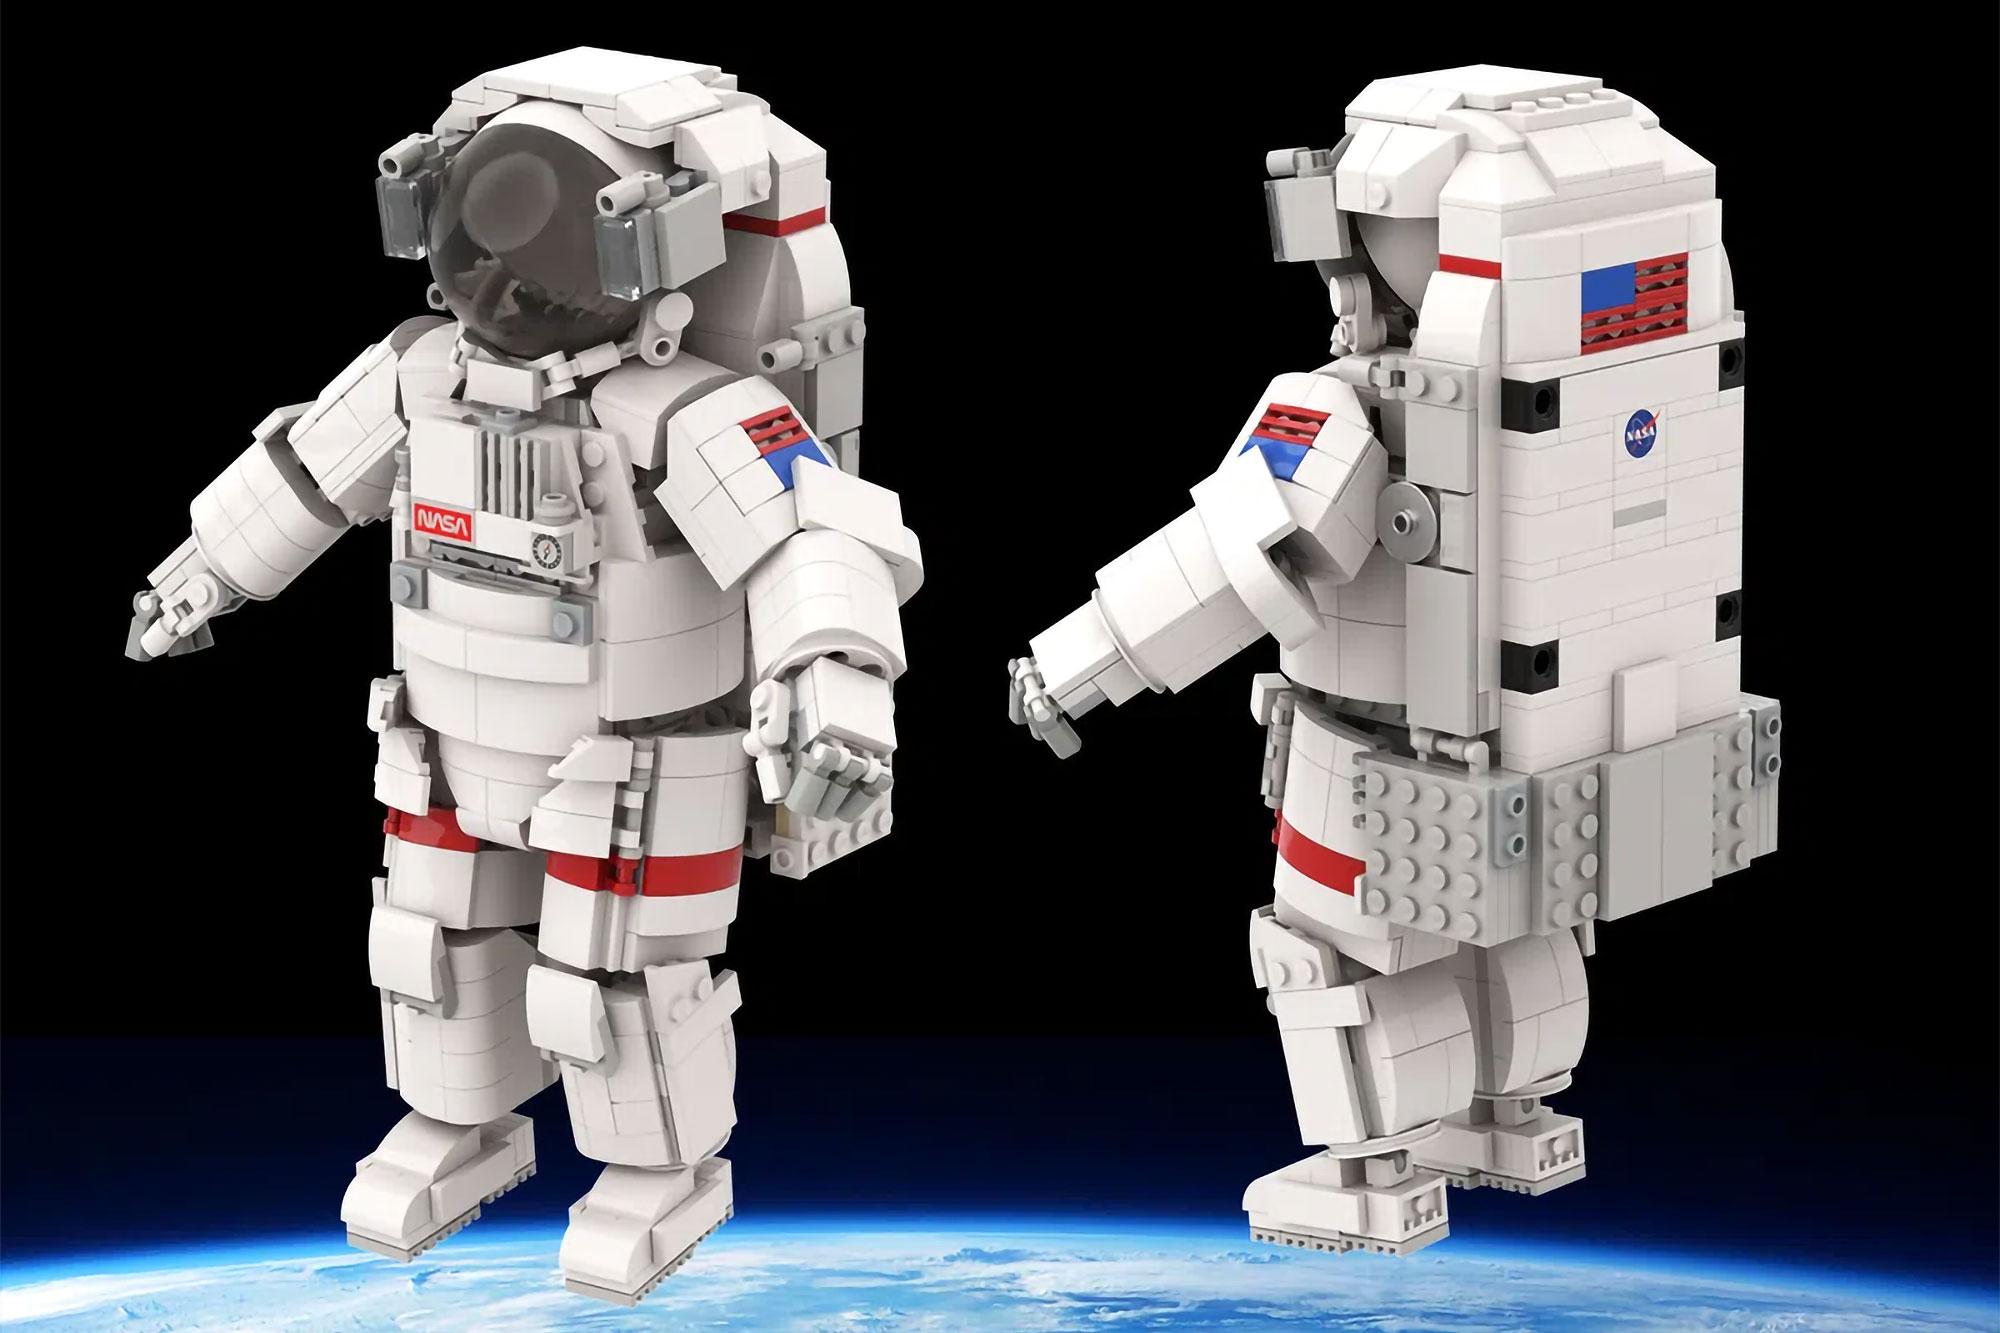 LEGO Astronaut by legotruman